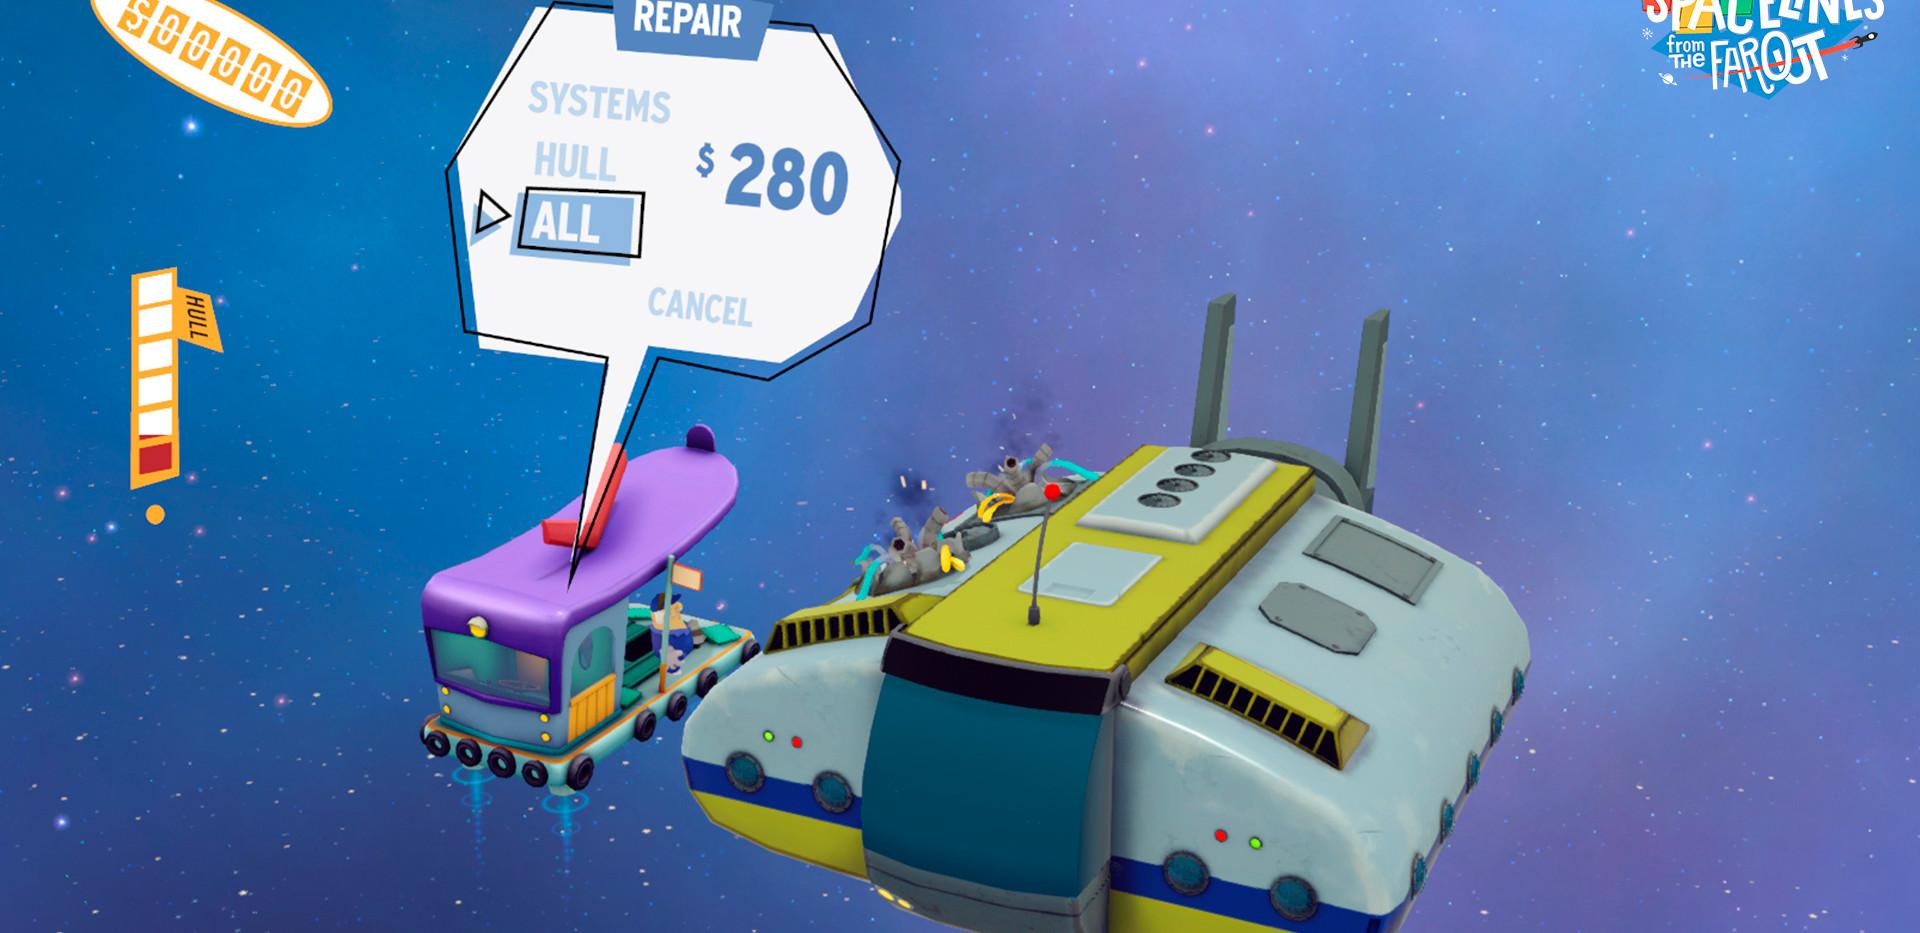 Repair Remote Service